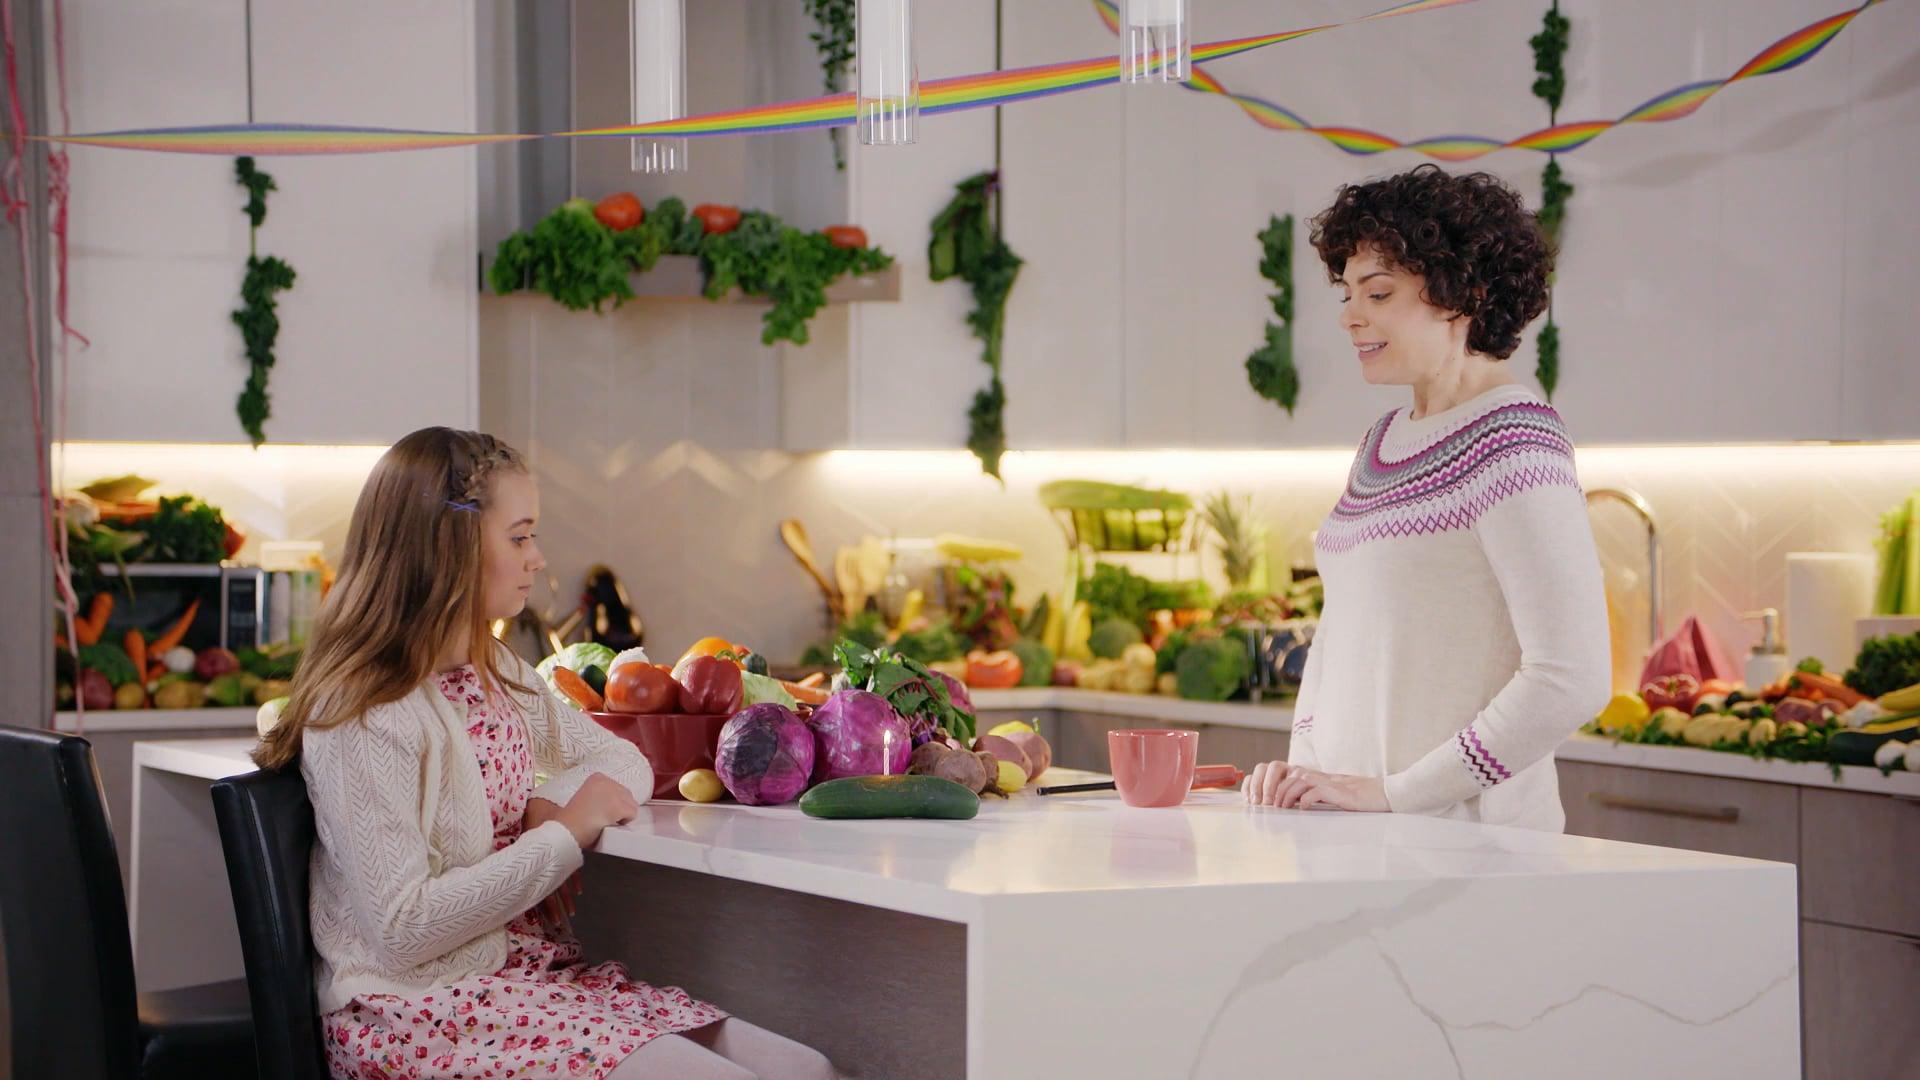 Redbox - Vegetables